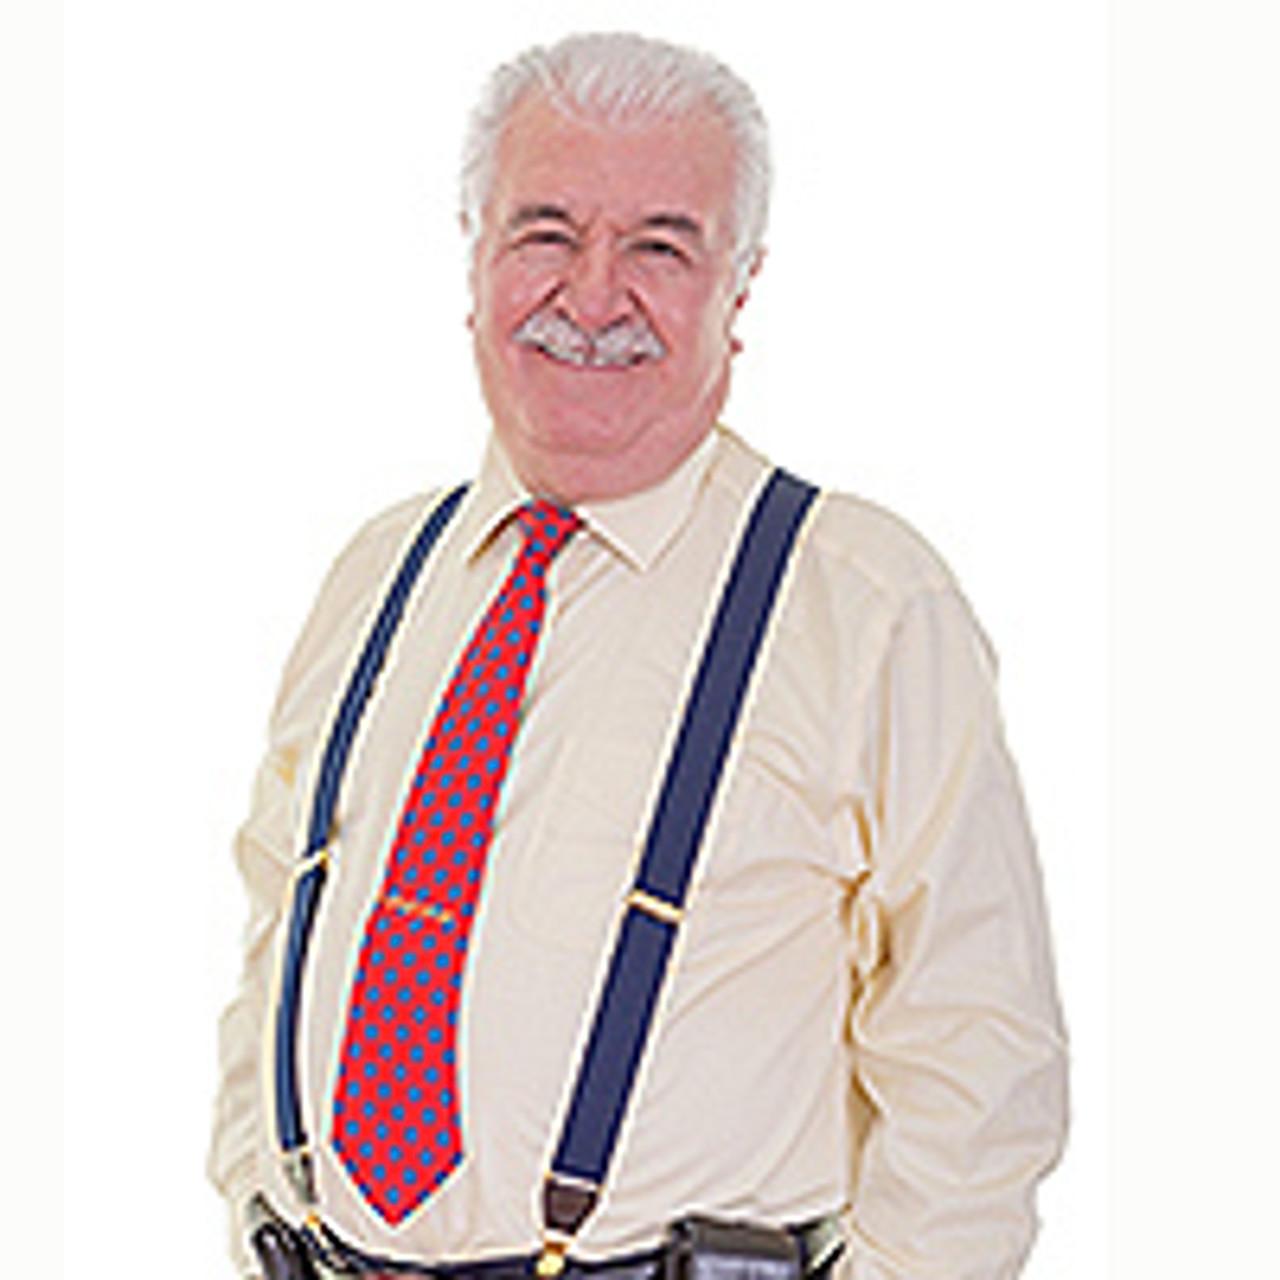 773b9d5d613 Big   Tall Suspenders - Casual   Formal